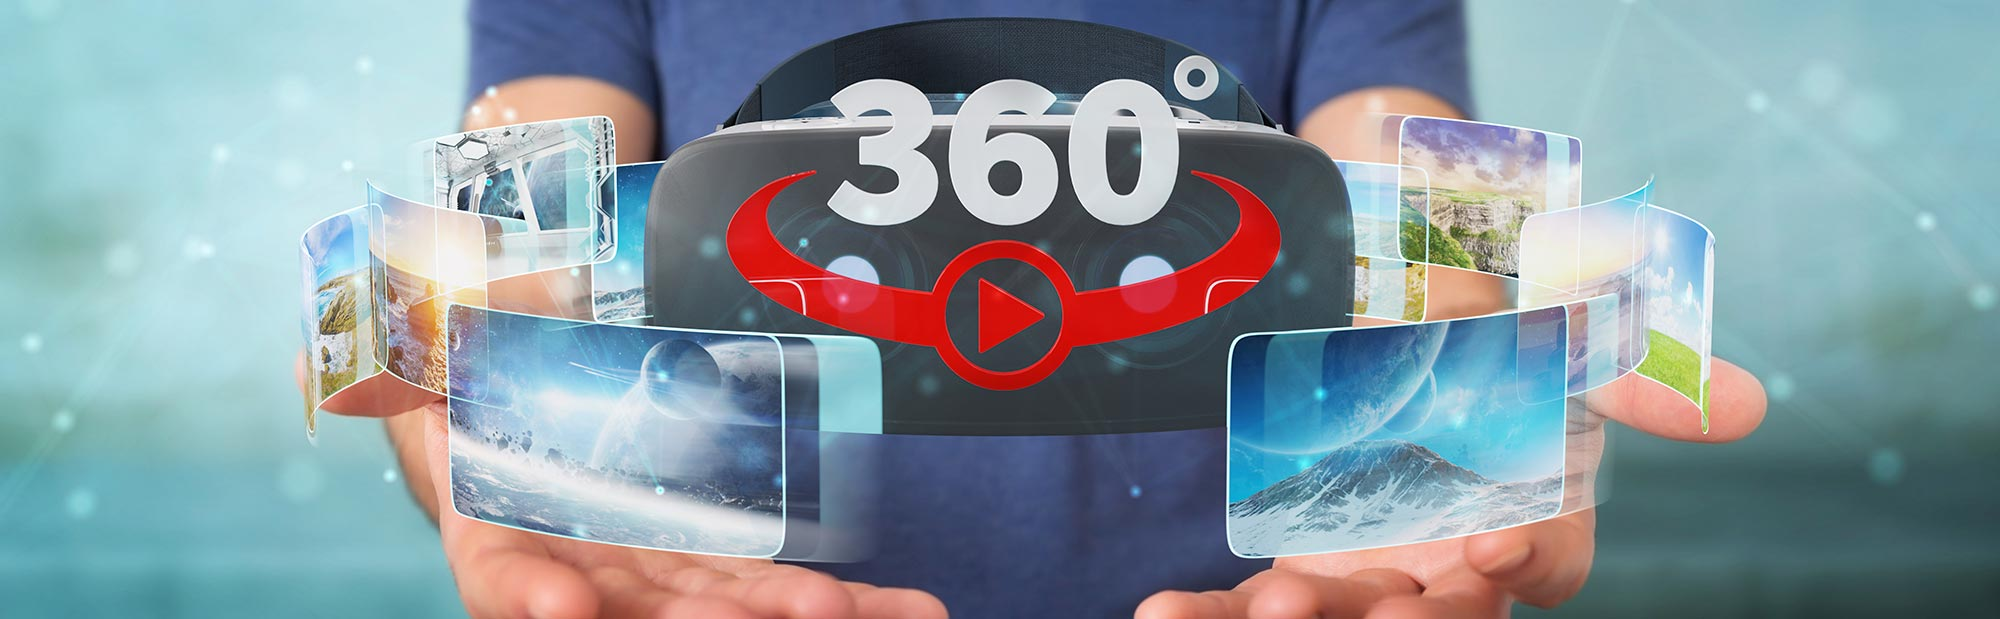 virtual tour 360 foto sferiche